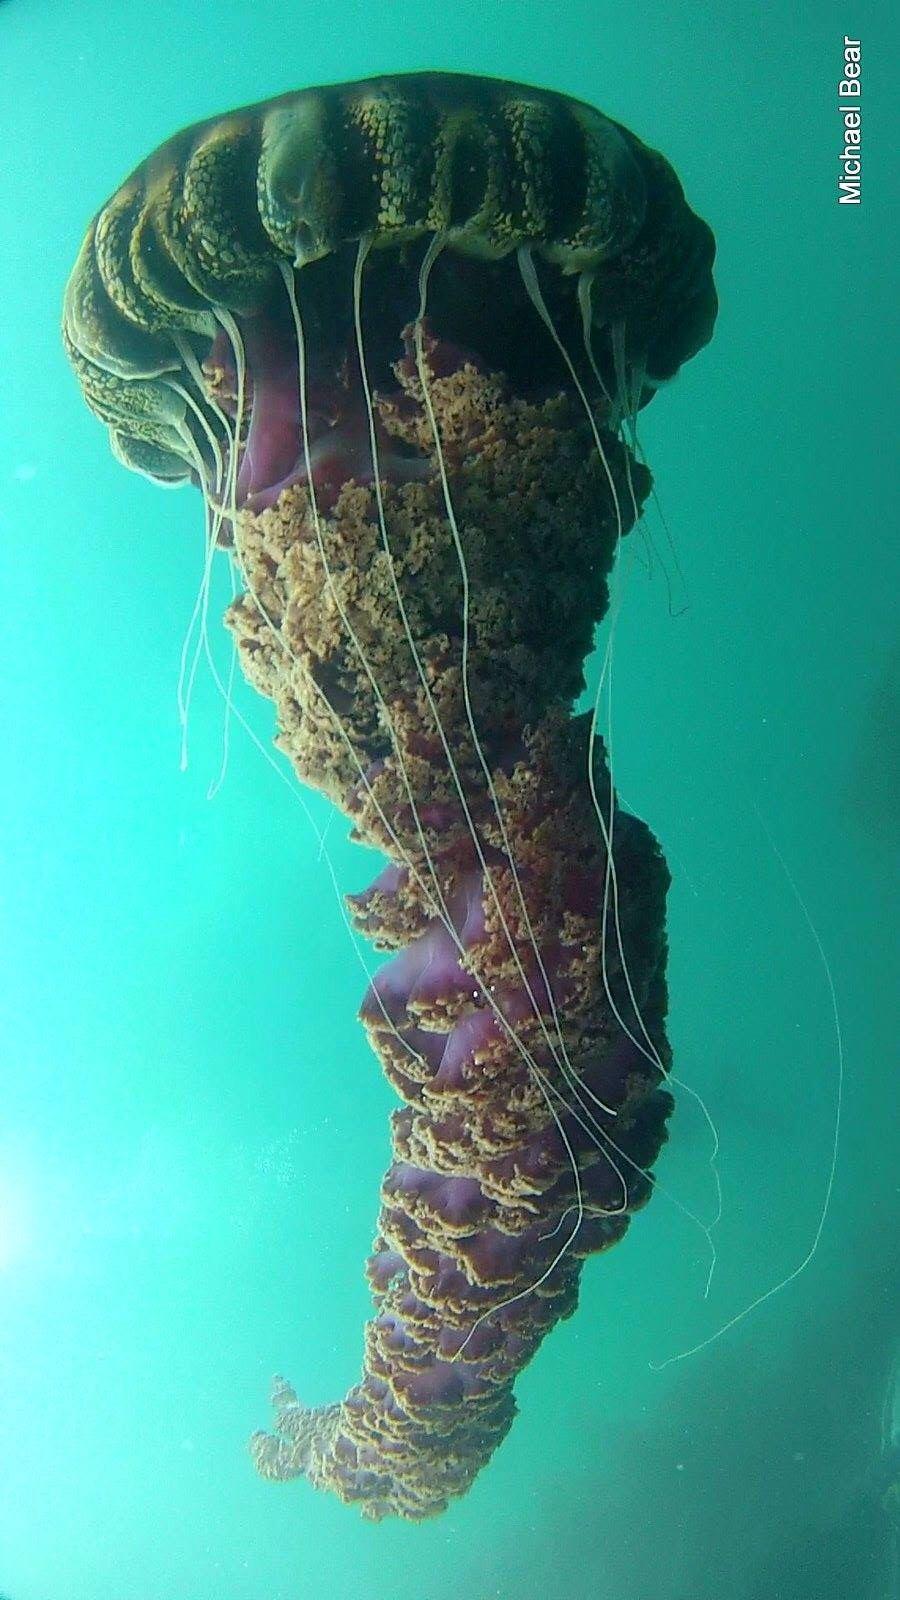 Huge jellyfish unda da sea pinterest for Jelly fish for sale